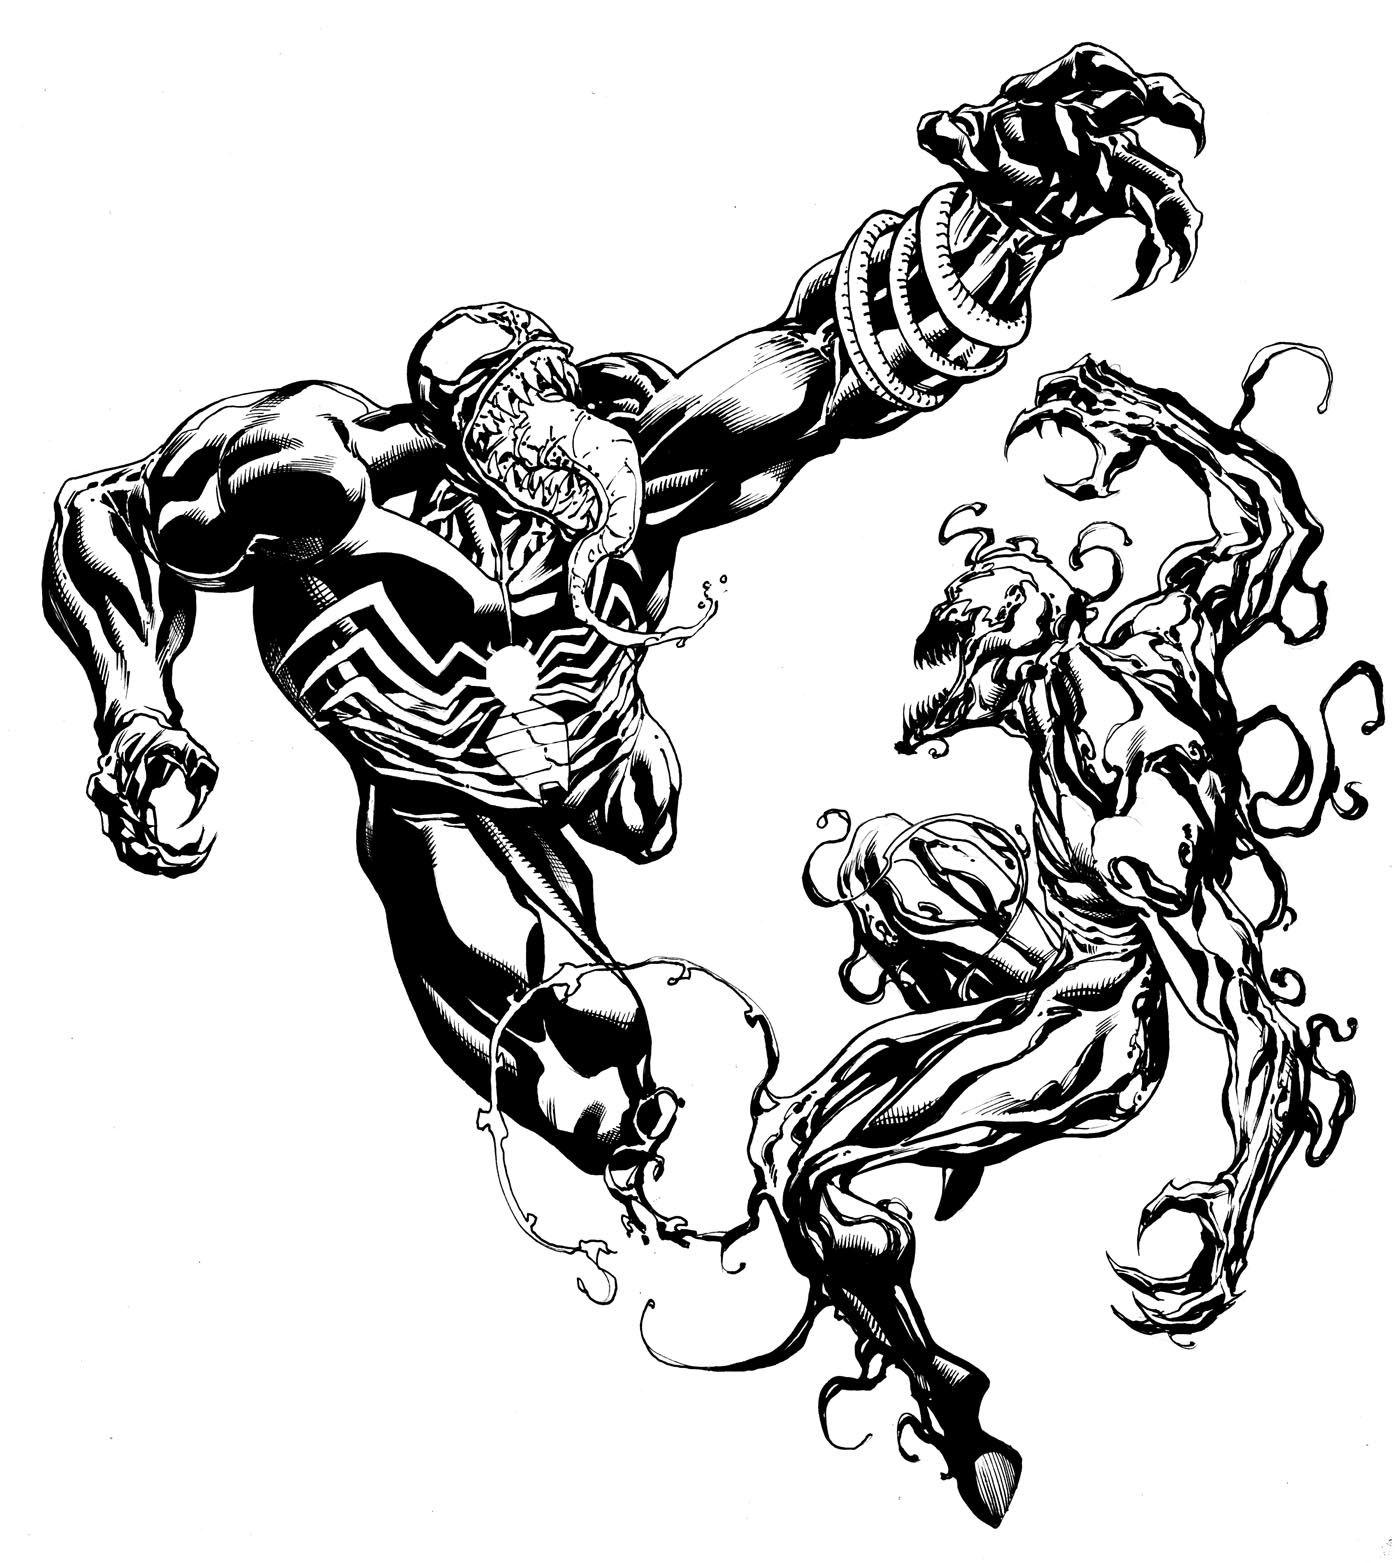 Robert Atkins Art Symbiote Partay Pt 2 Venom And Carnage